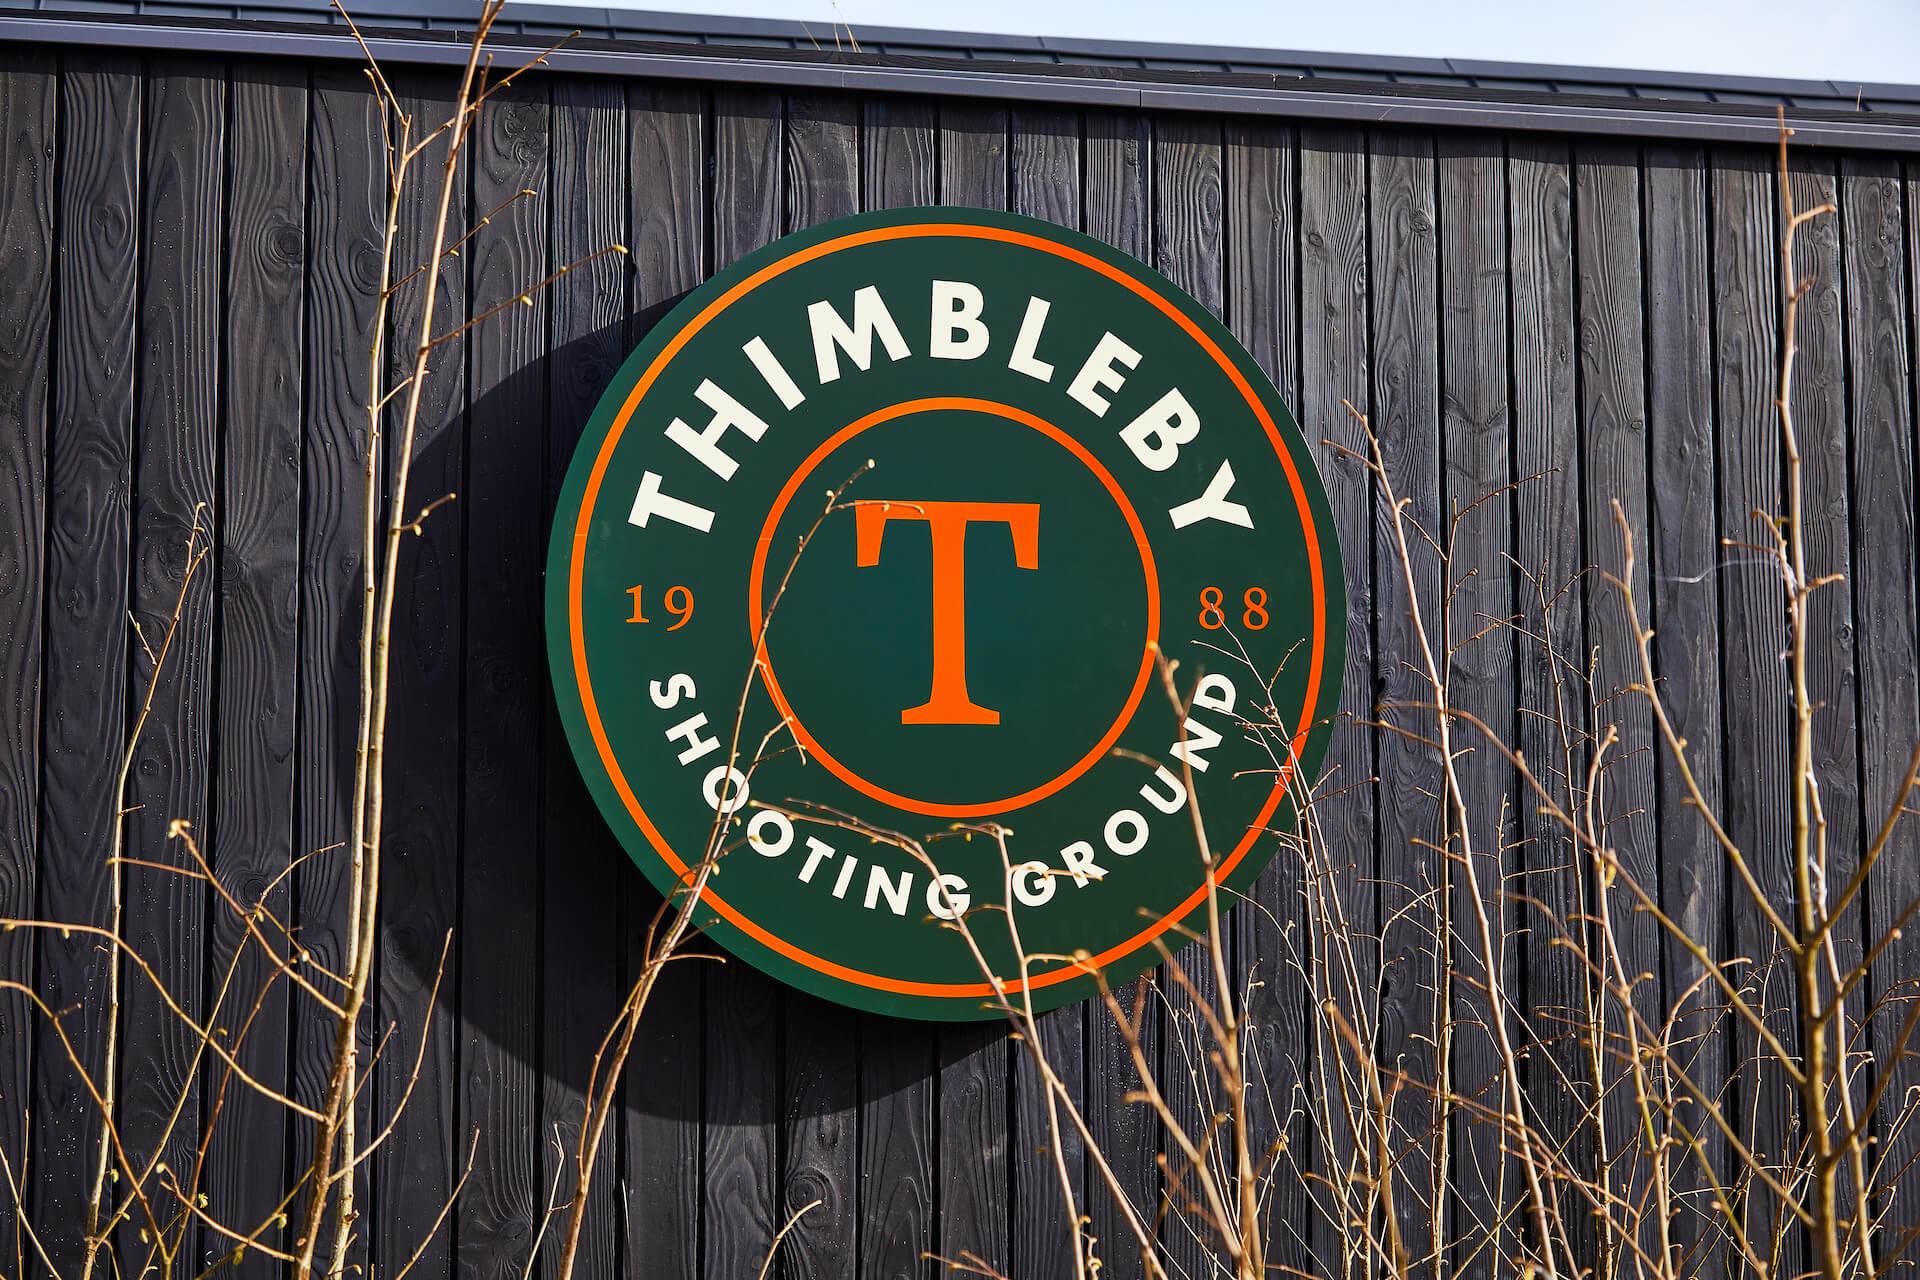 thimbleby shooting ground 11